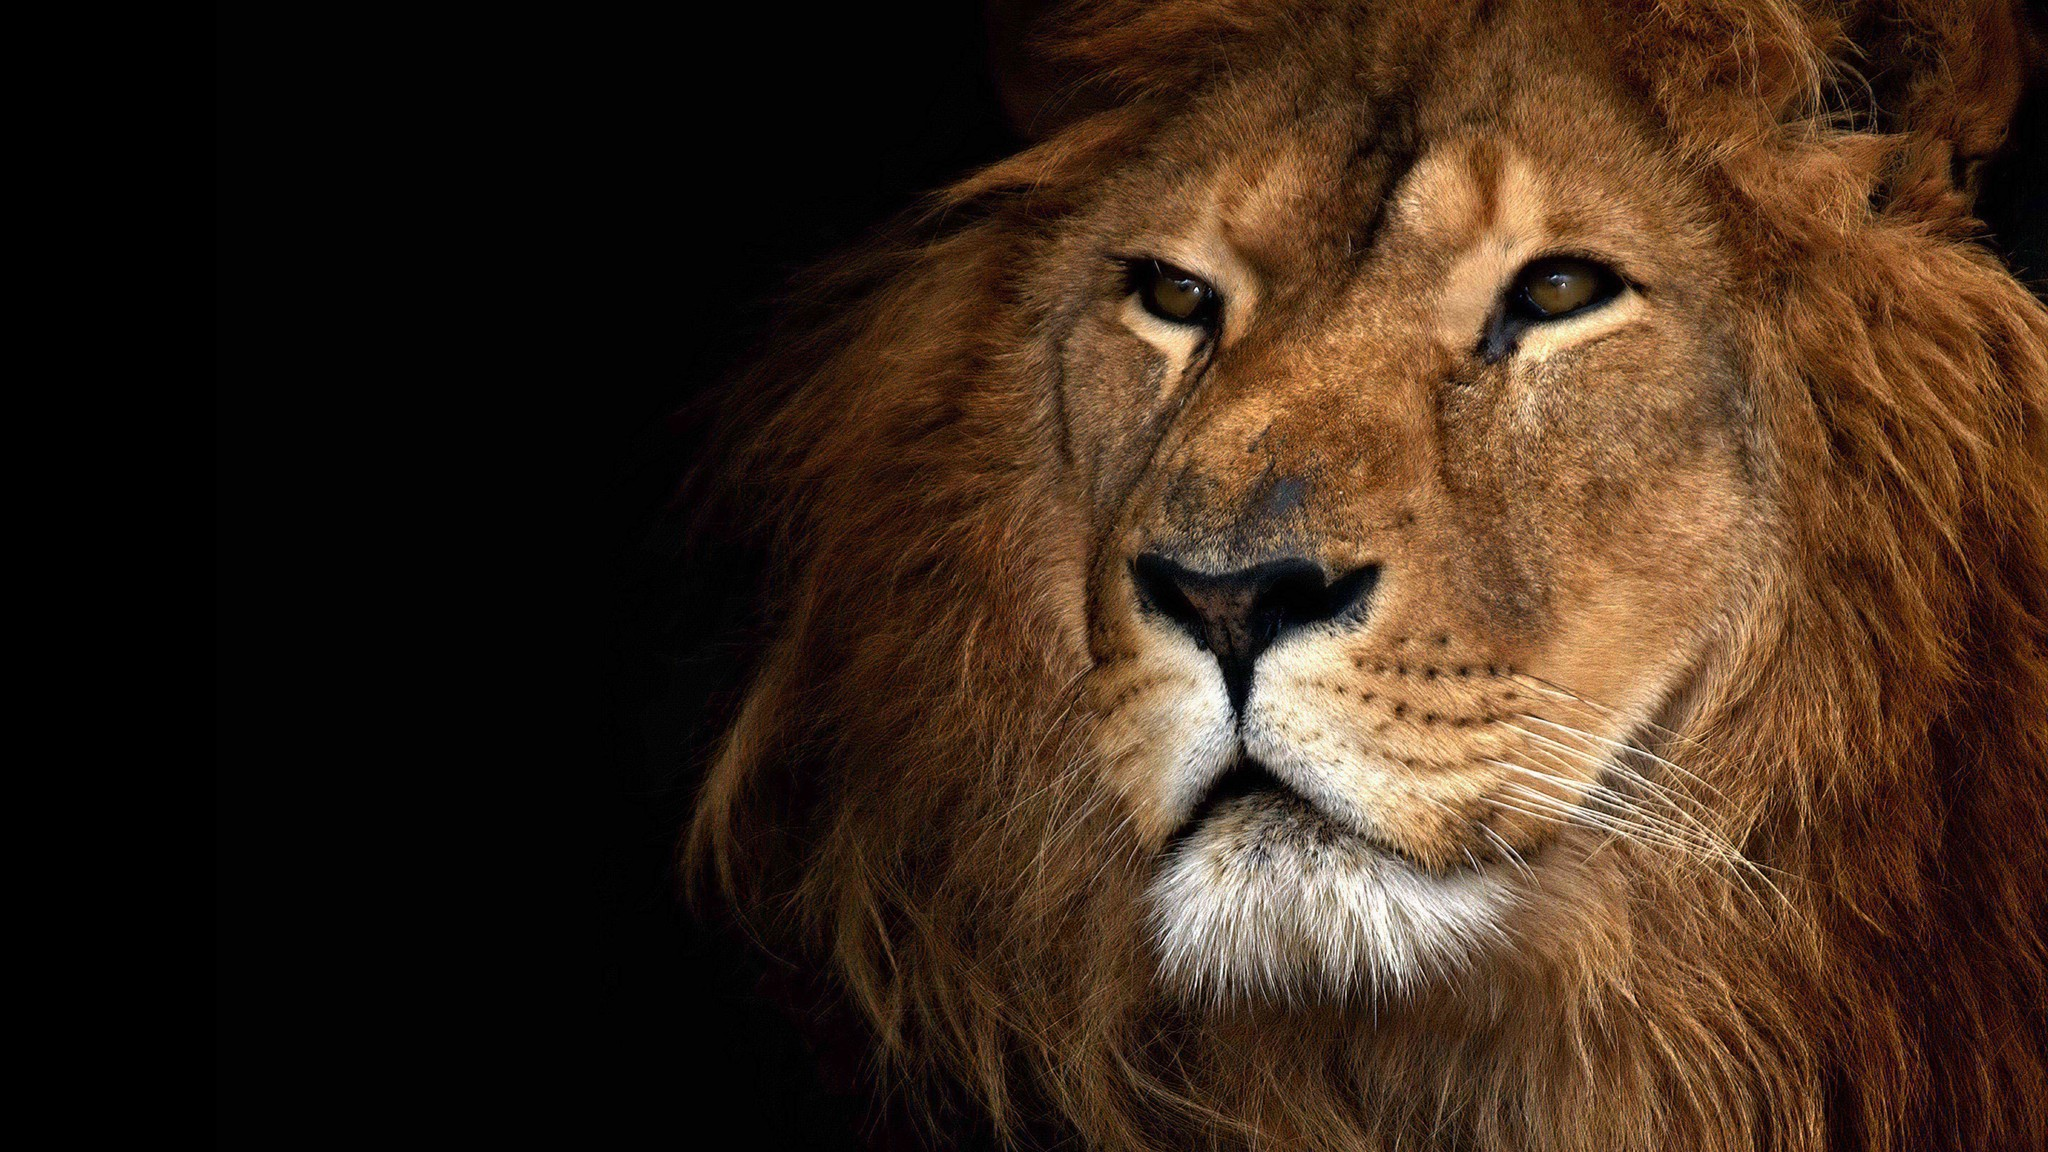 Most Inspiring Wallpaper Macbook Lion - Apple-Lion-Wallpapers-031  Pictures_174863.jpg